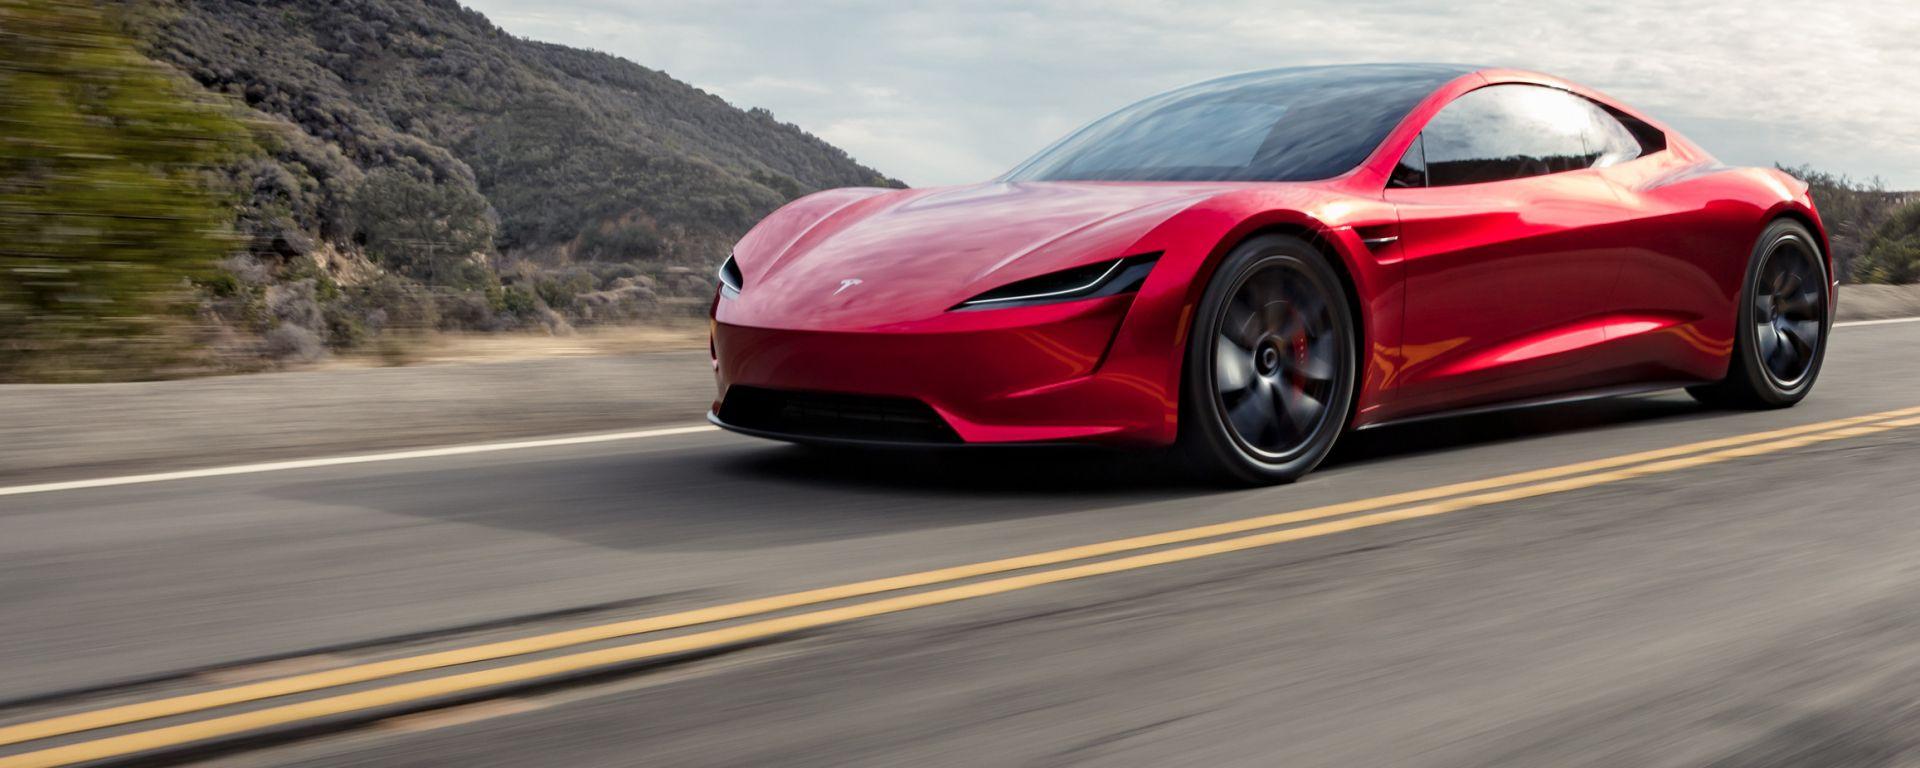 Tesla Roadster: vista 3/4 anteriore